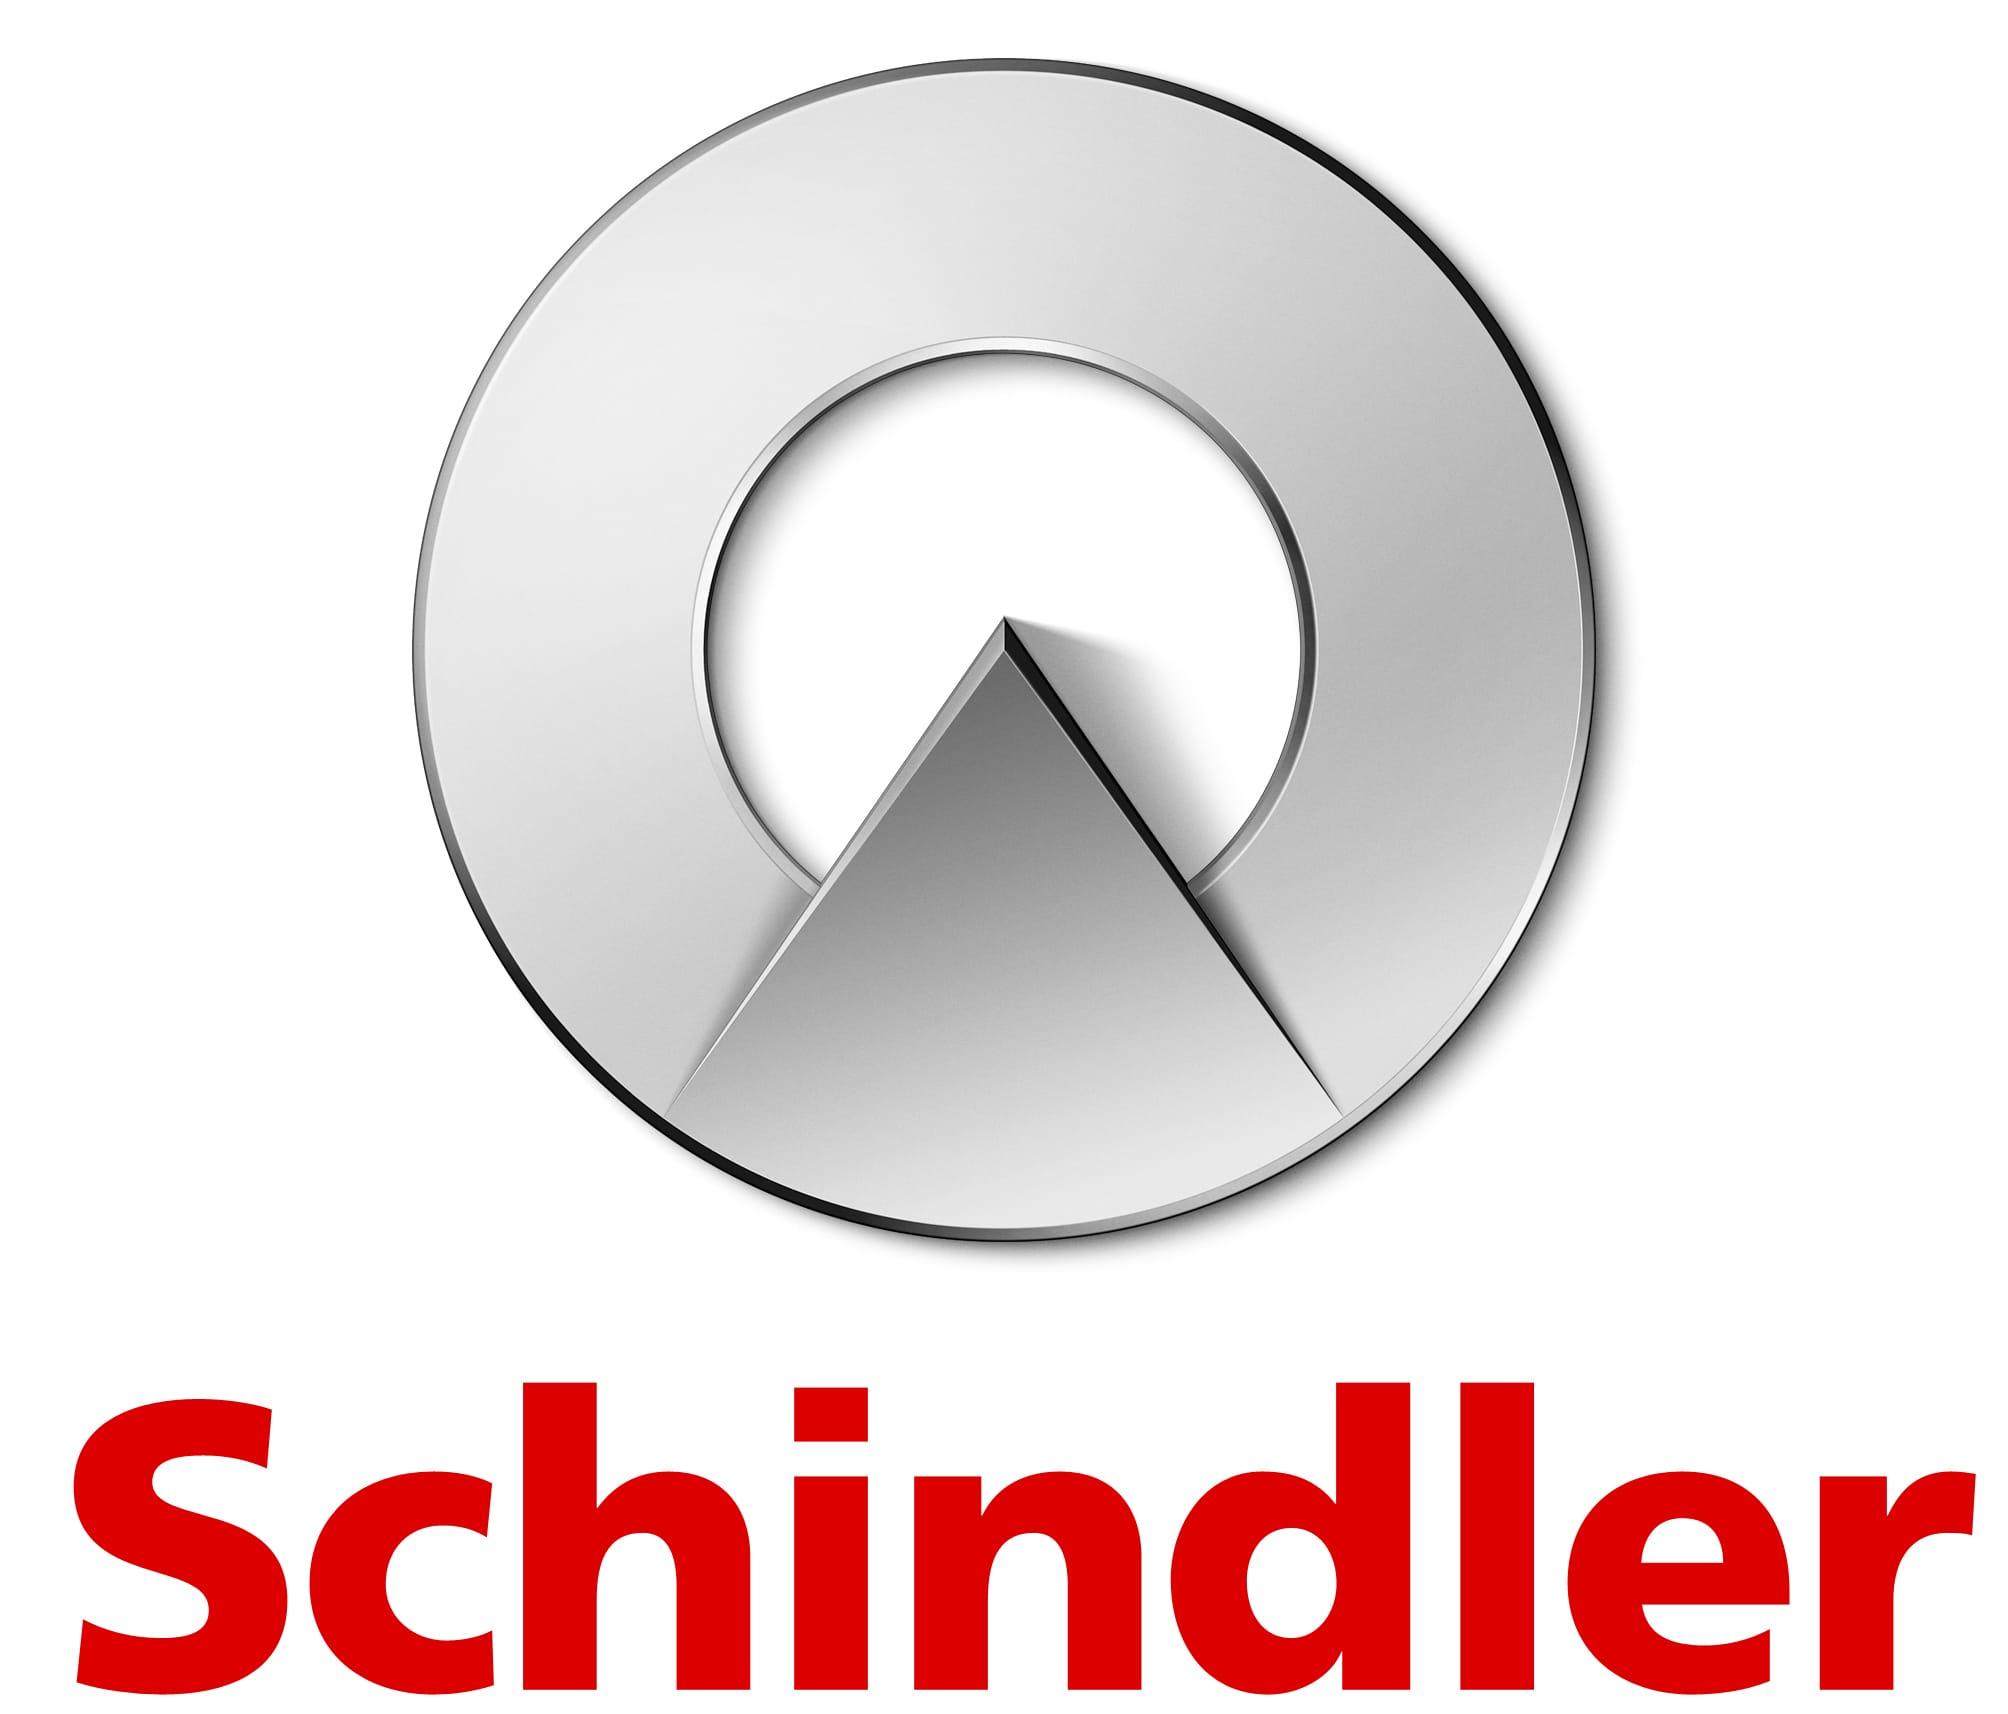 Schindler Eskalátory, s.r.o.